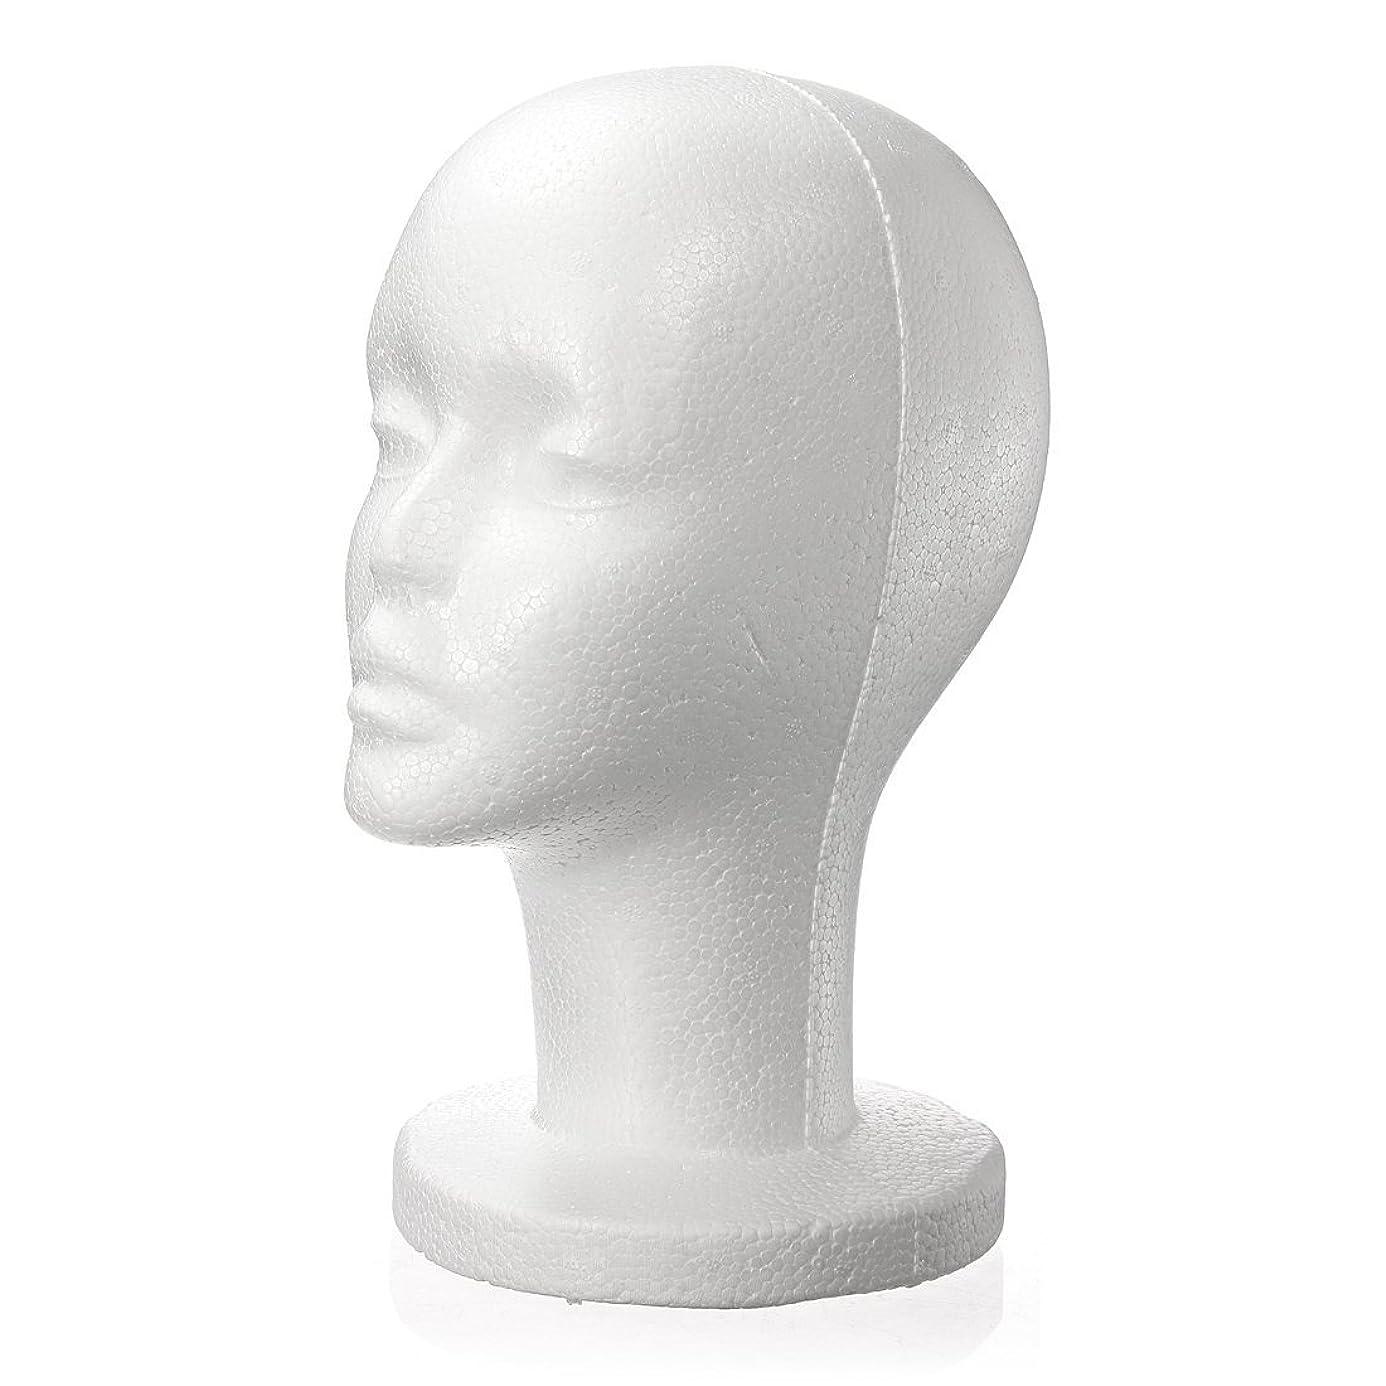 Mannequins - Nocm Fashion Female White Foam Styrofoam Mannequin Hat Cap Dummy Wig Head Display Holder Model - Full Lifesize Stand Upper Child Head Face Life Body Model Size Wigs Foam Hair D